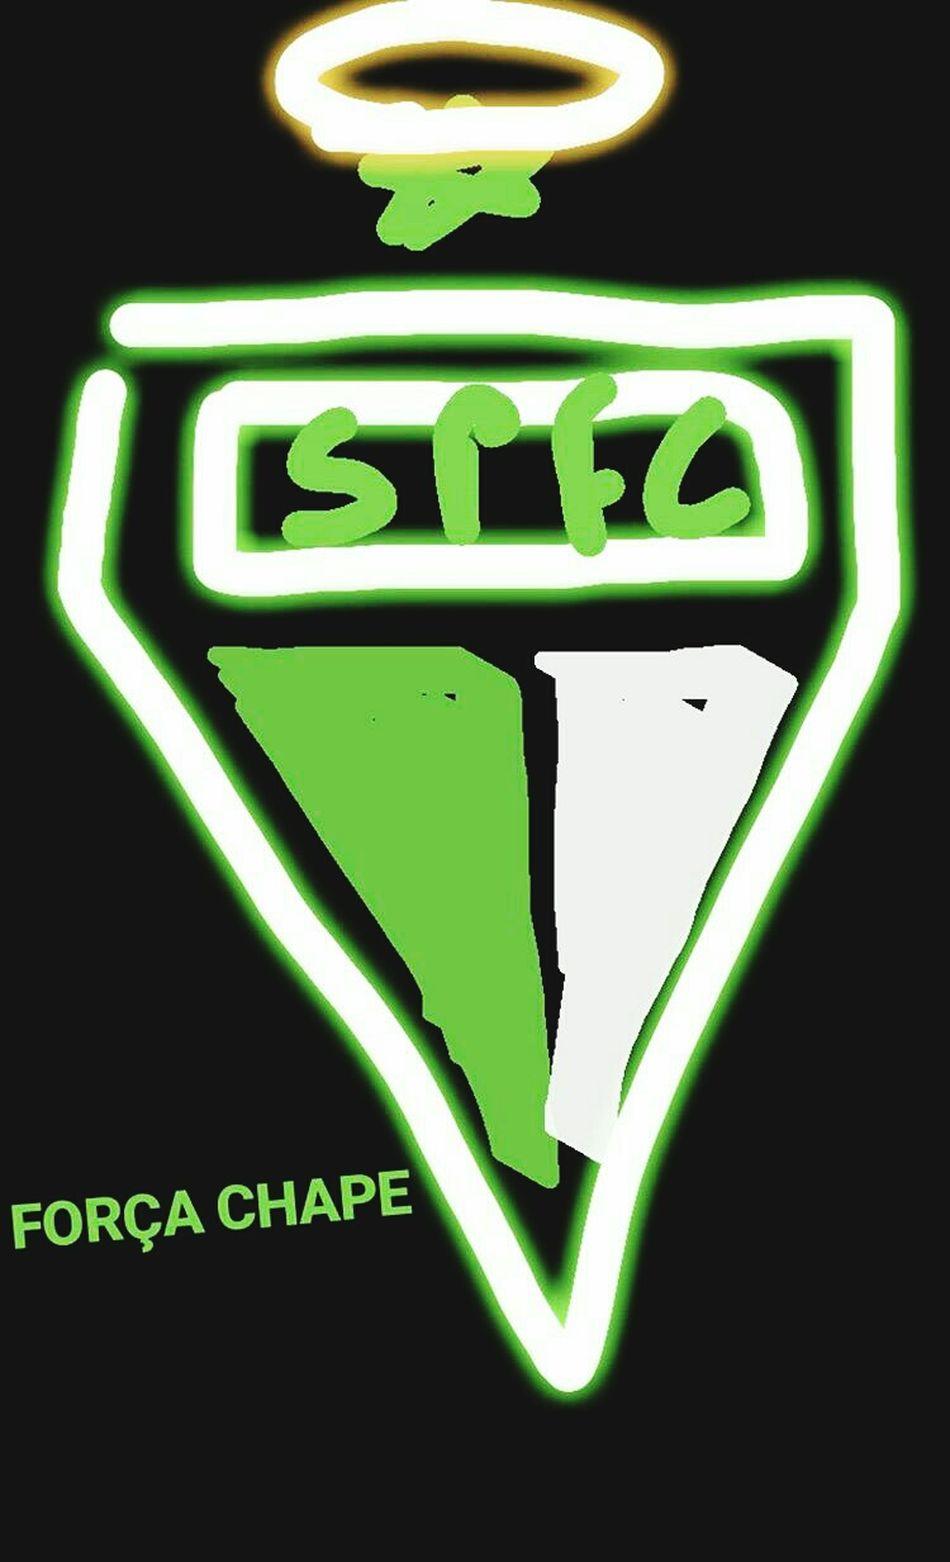 Futebol Brasil Chapecoense São Paulo FC Força Chape Força Chape